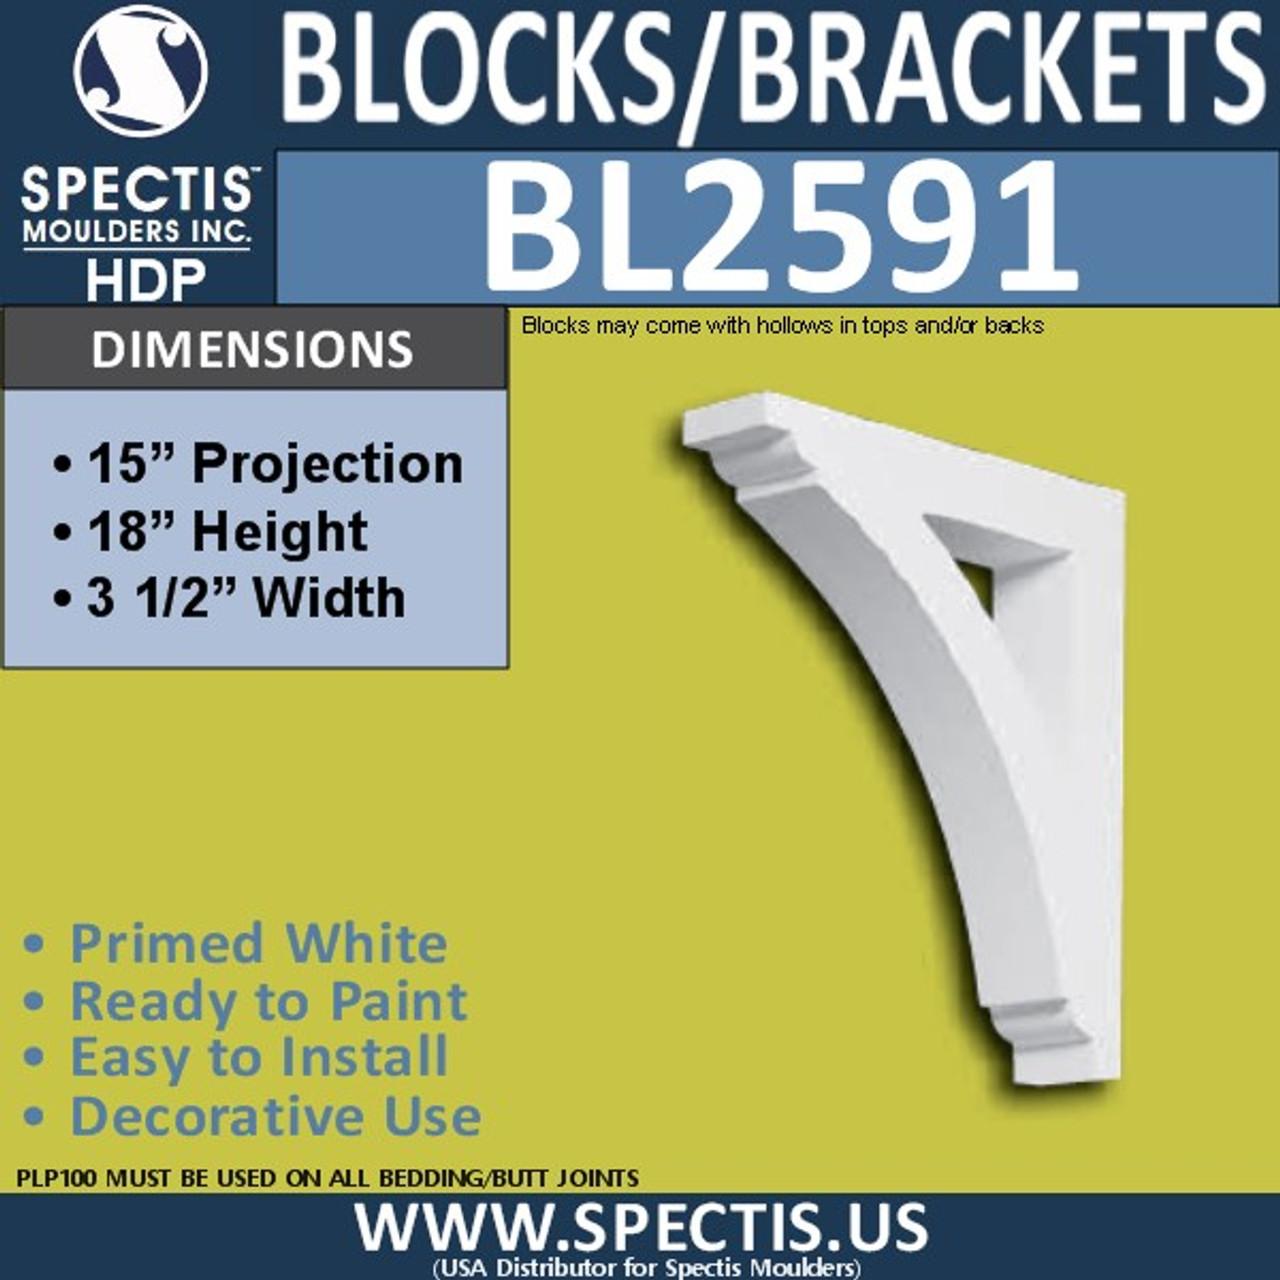 "BL2591 Eave Block or Bracket 3.5""W x 18""H x 15"" P"